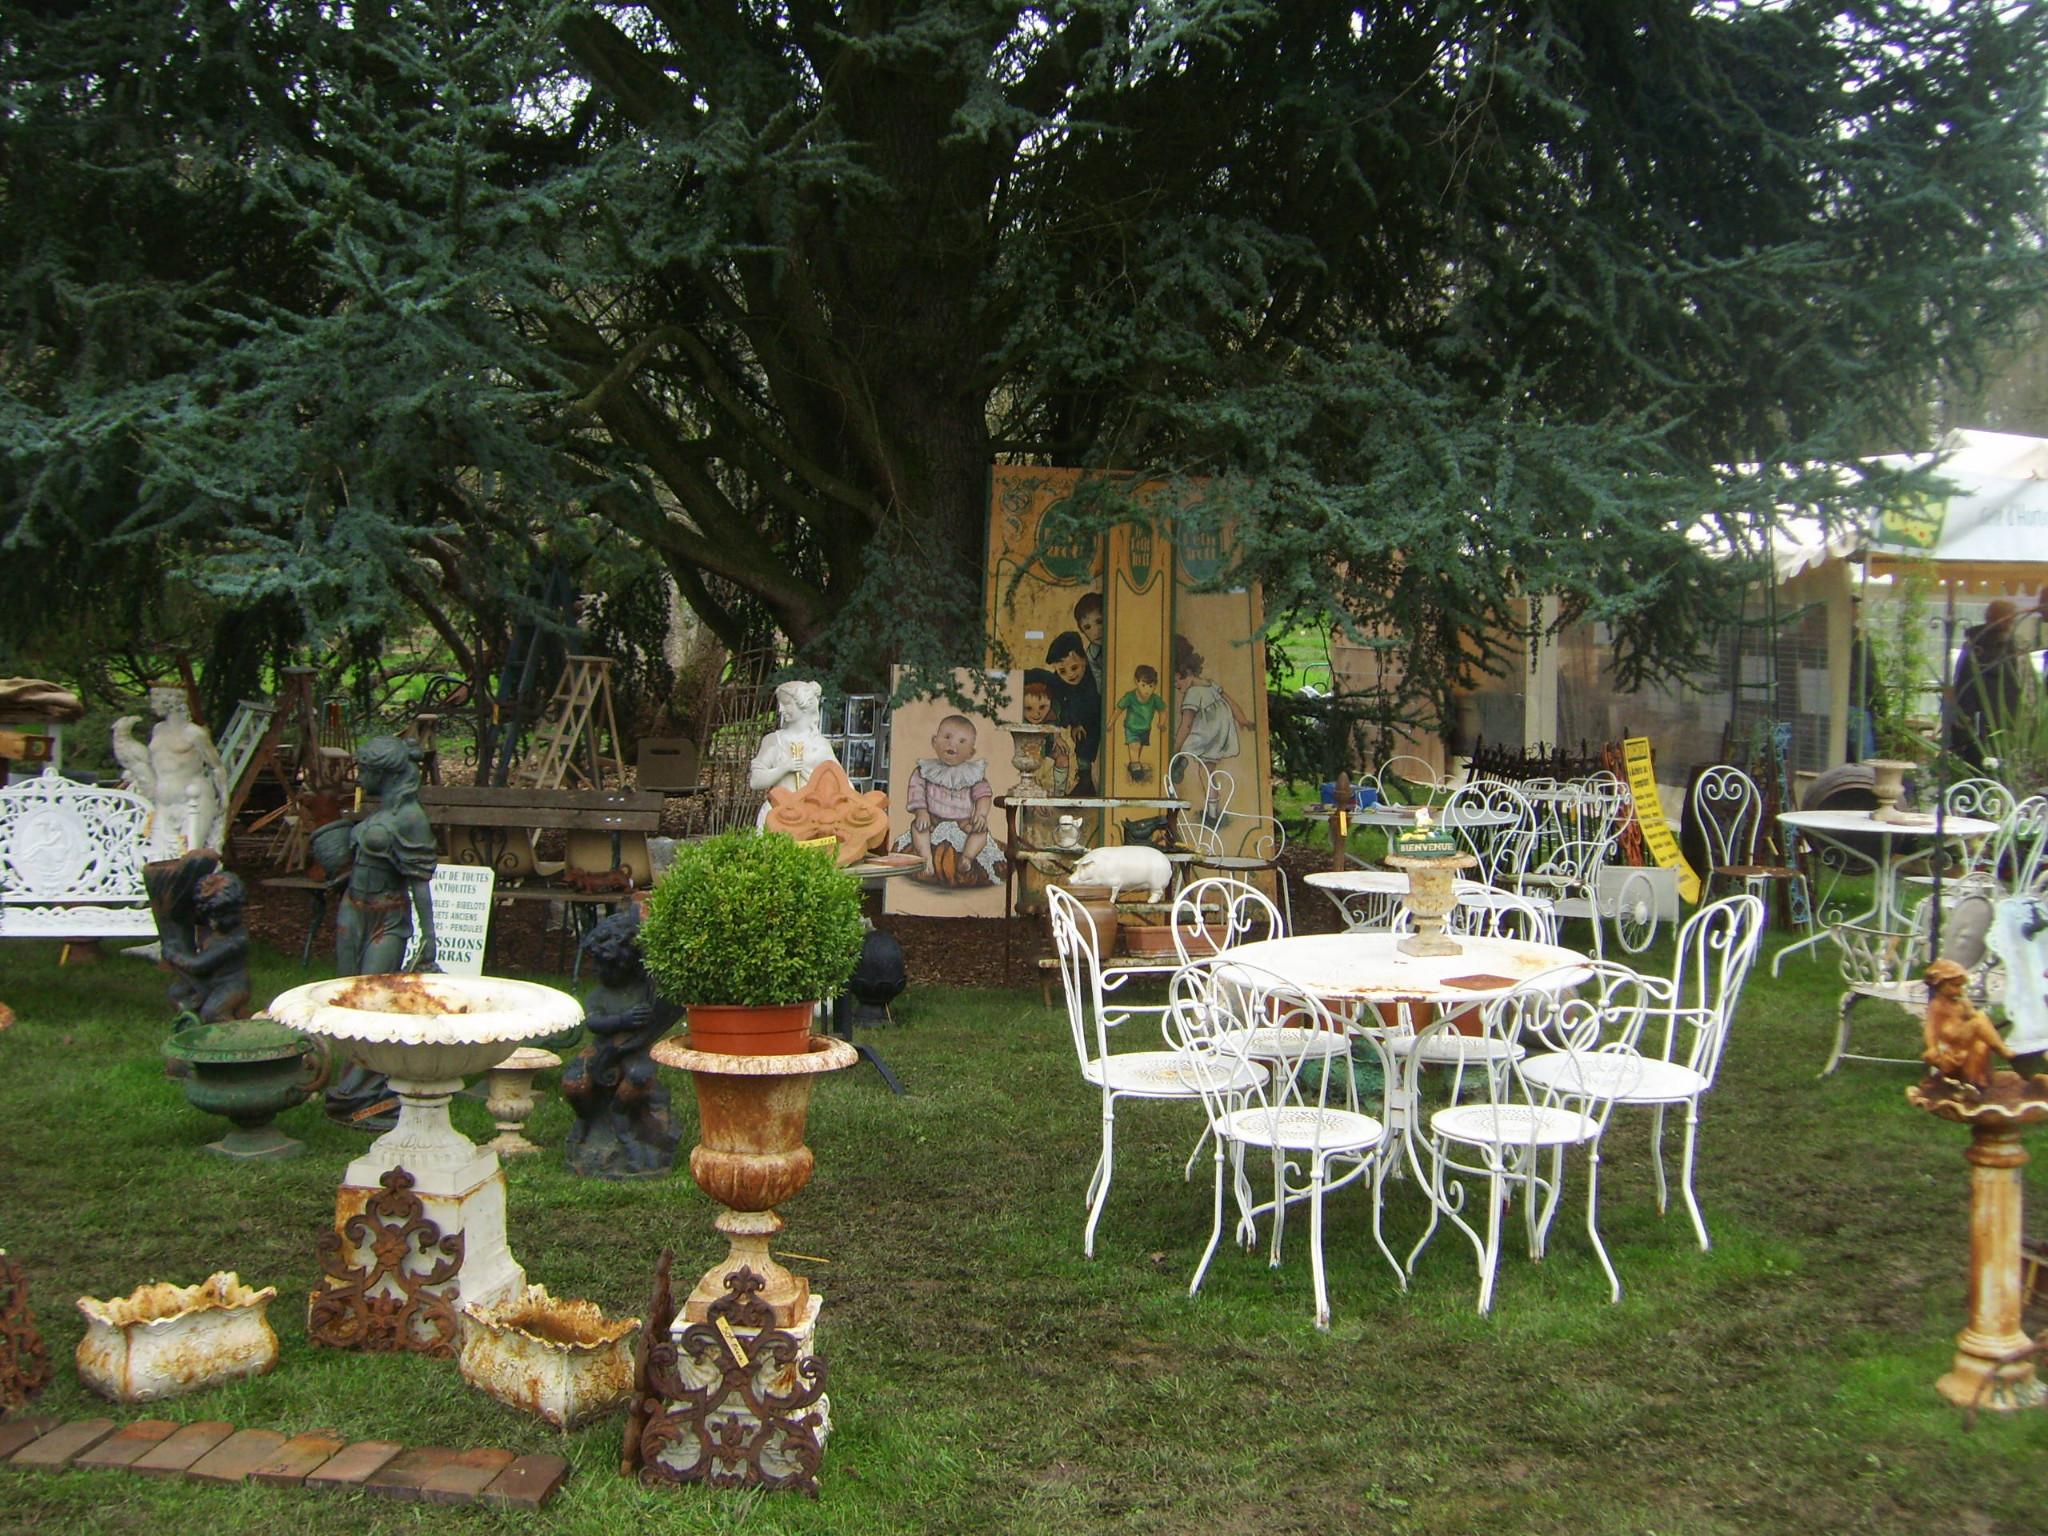 nibelle et baudouin escapade au salon des arts du jardin. Black Bedroom Furniture Sets. Home Design Ideas